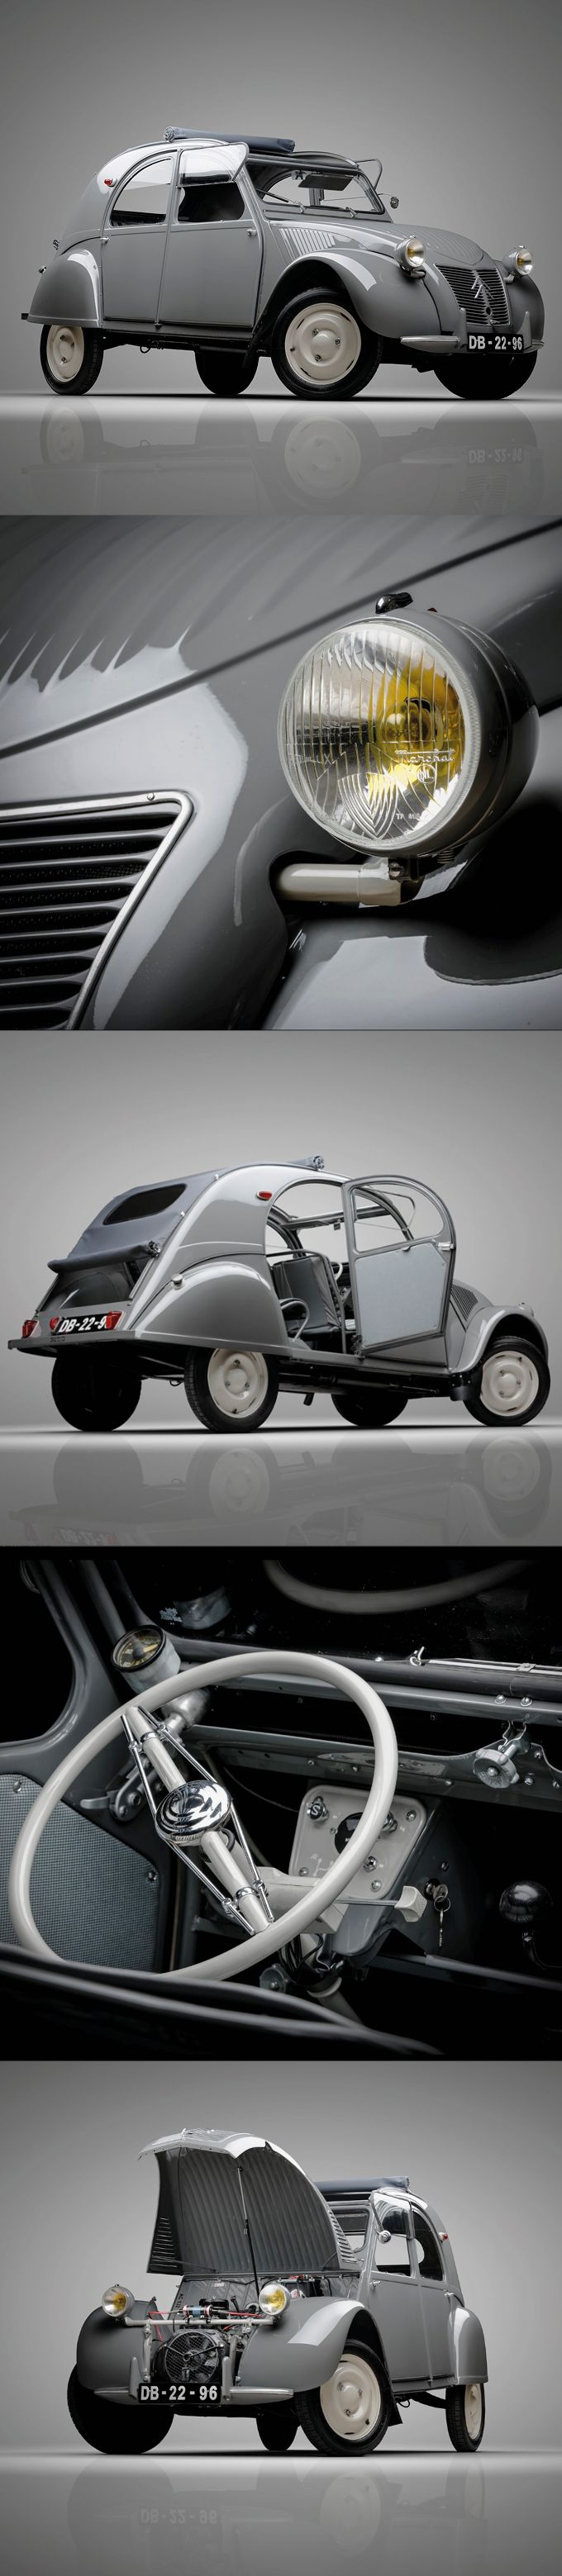 1948 Citroën 2CV / ripple bonnet / France / grey white / photography: Pedro Mota